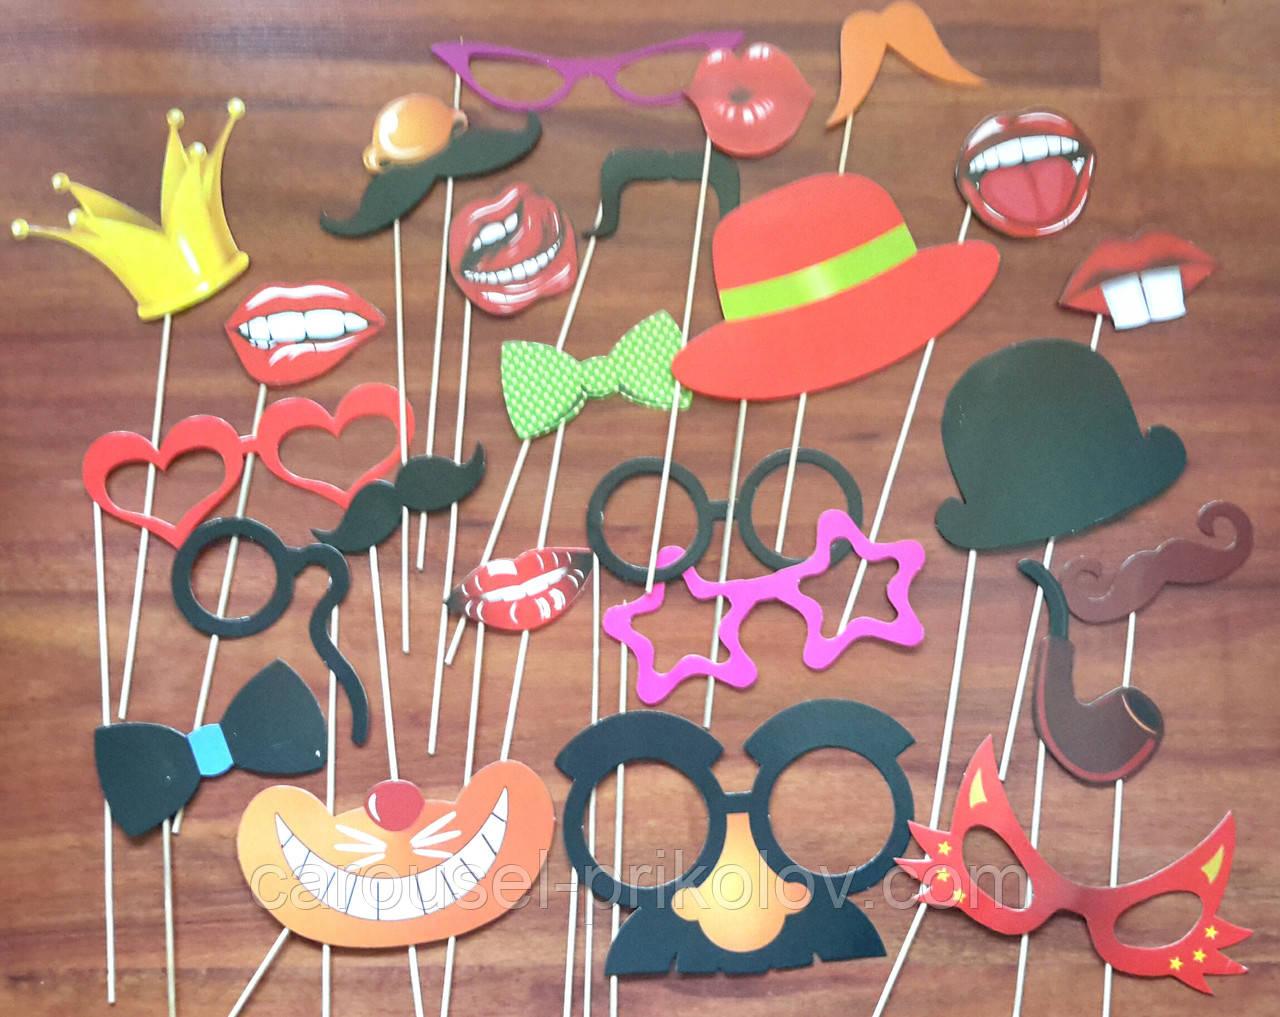 Фотобутафория прикольна губки, вуса, окуляри, капелюшки, метелики, корона 25 предметів